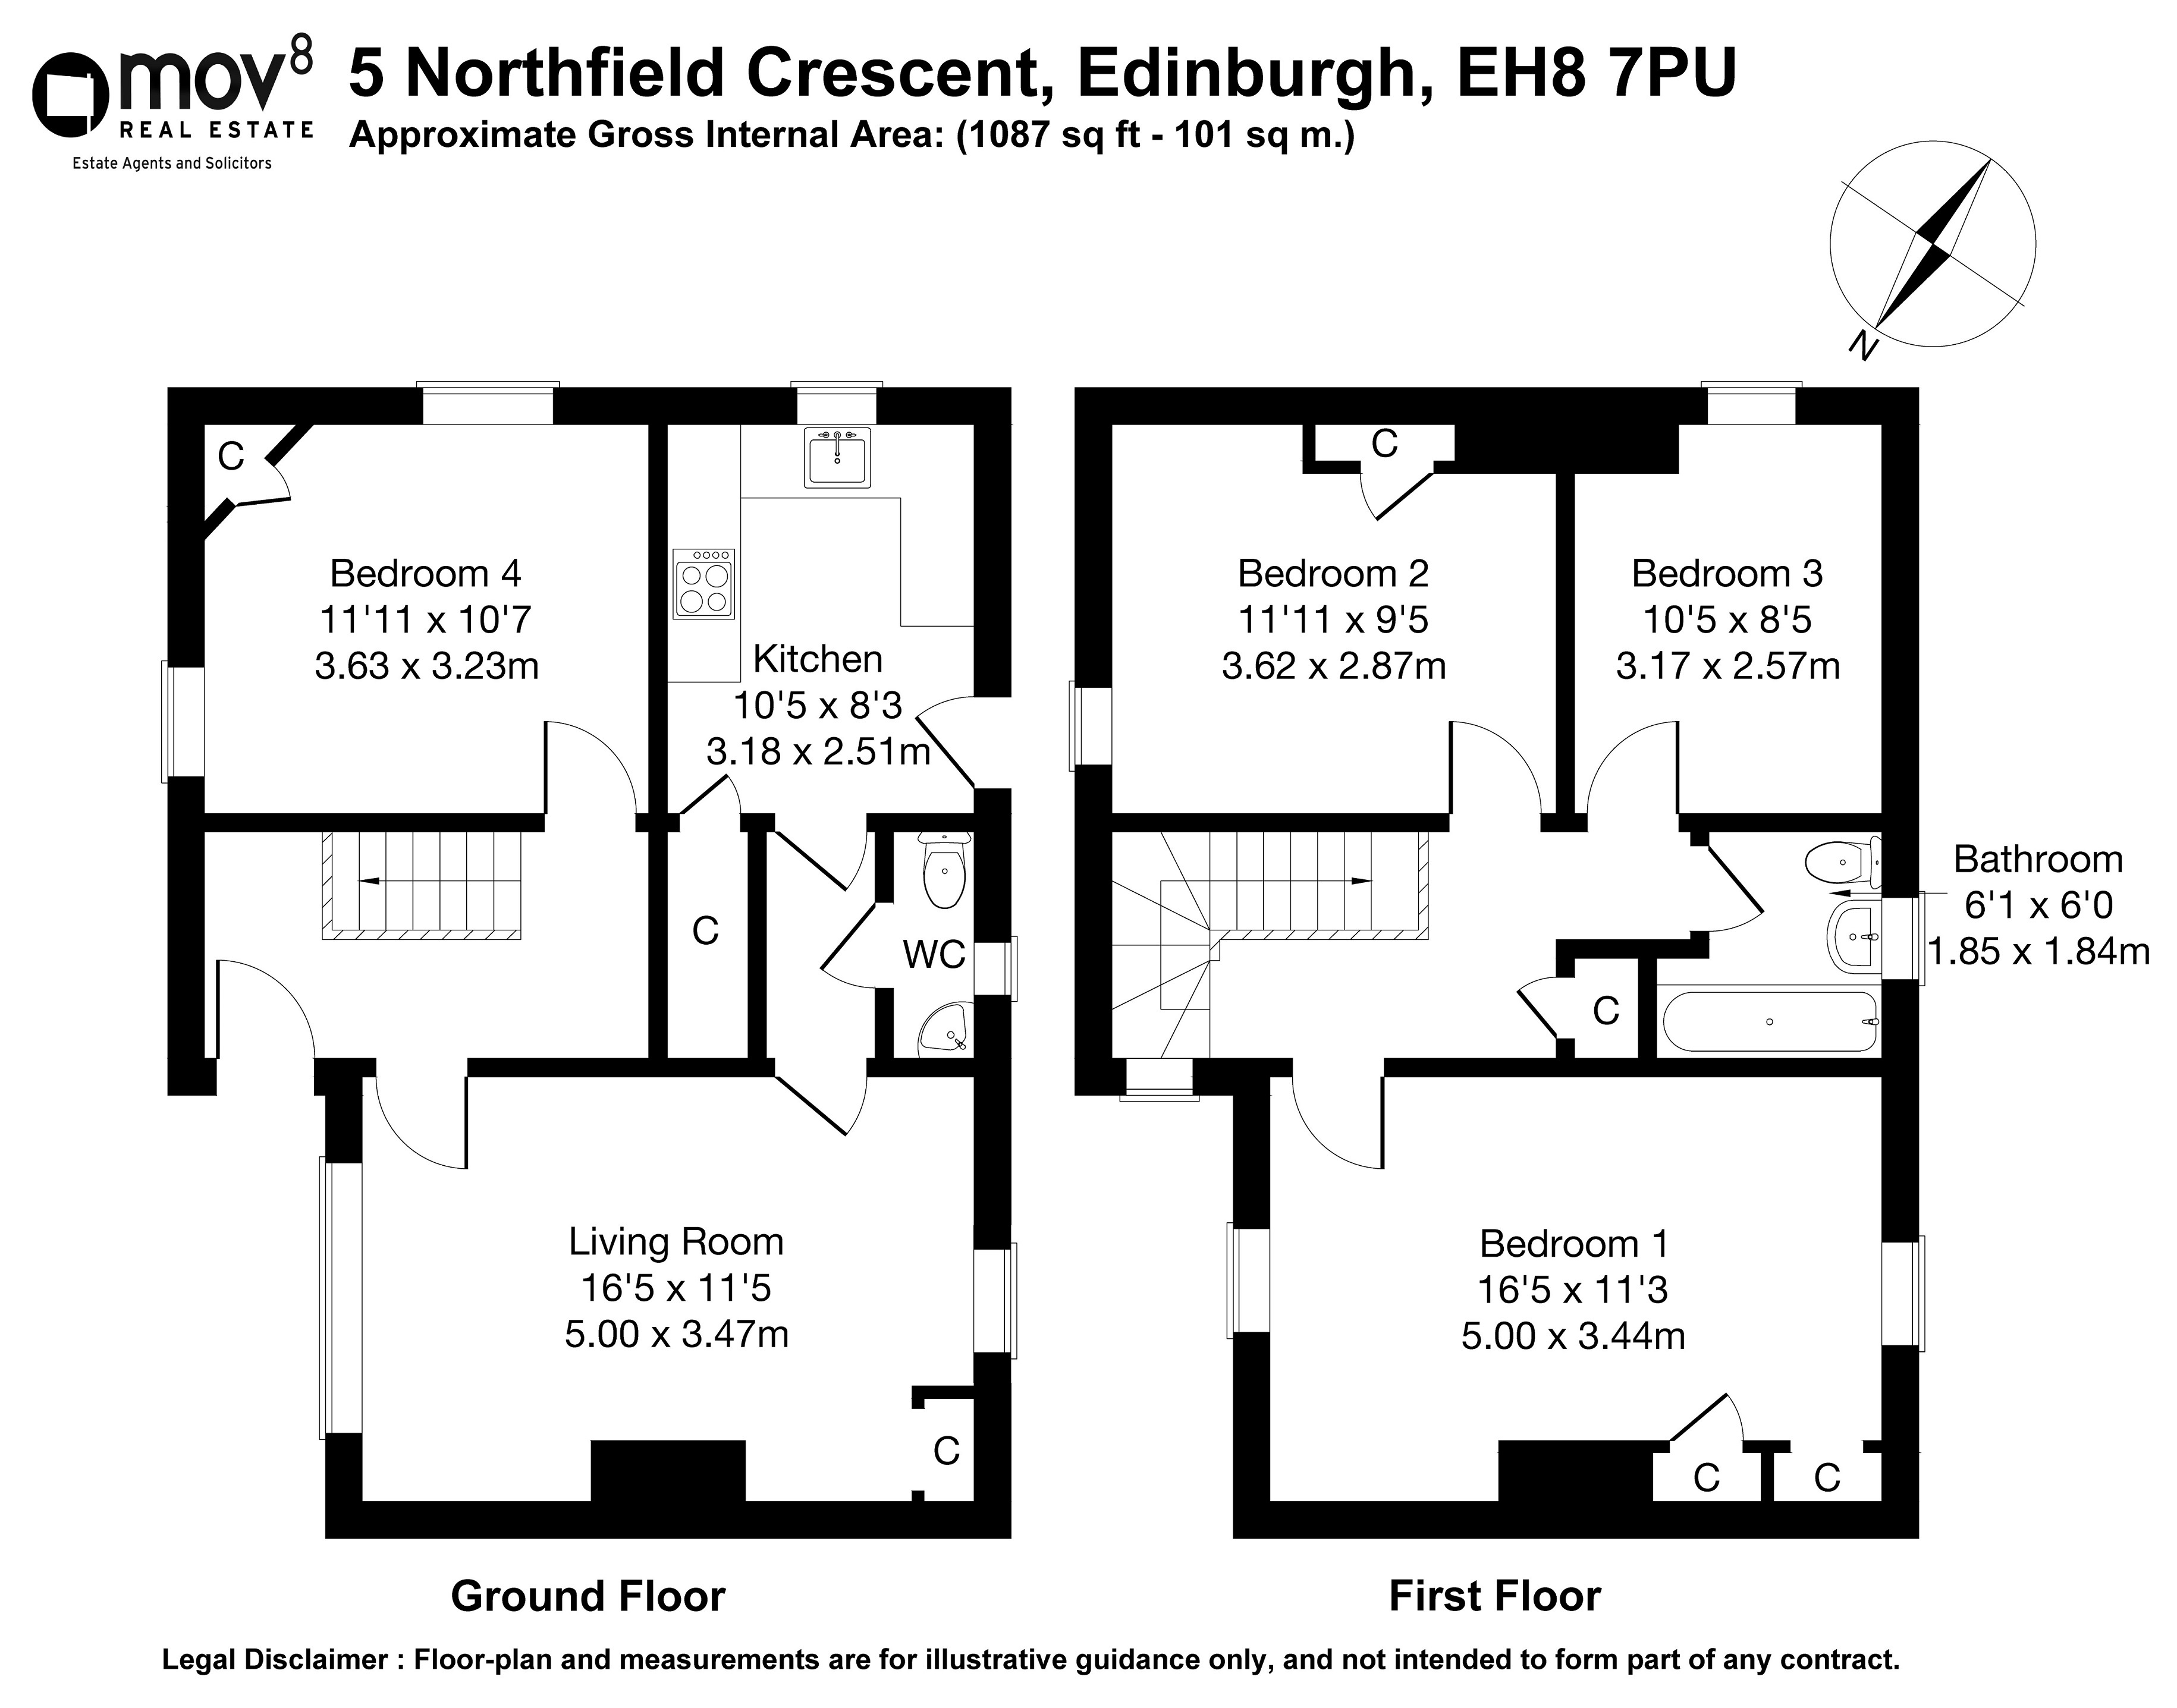 Floorplan 1 of 5 Northfield Crescent, Northfield, Edinburgh, EH8 7PU